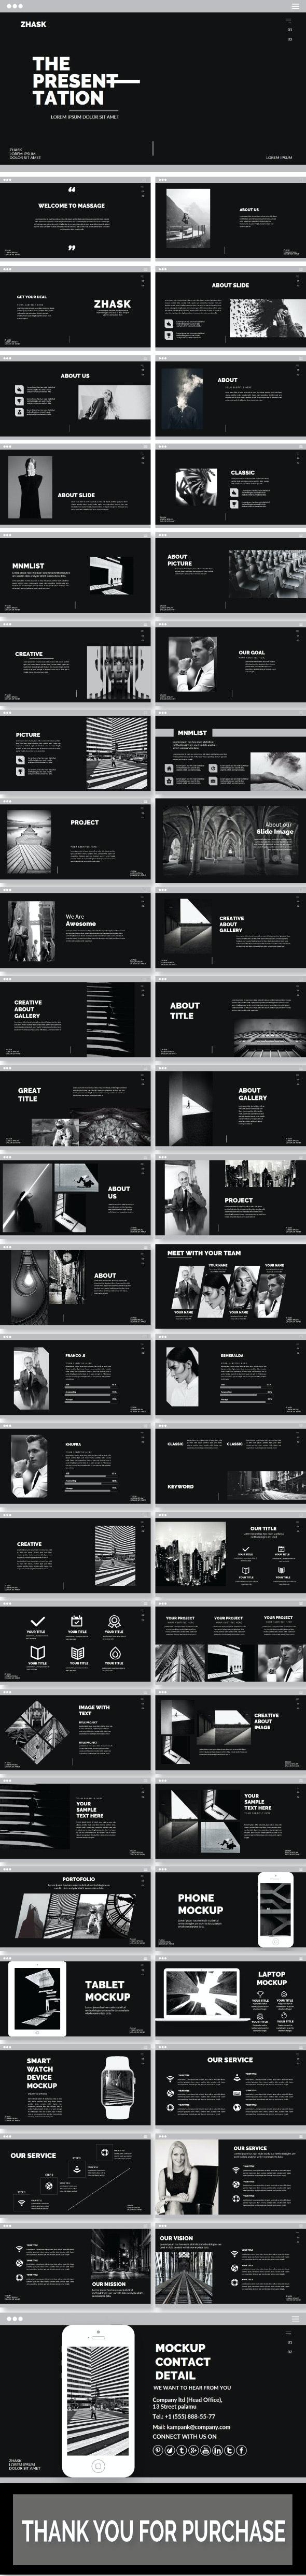 Zhask Presentation Template - Creative PowerPoint Templates